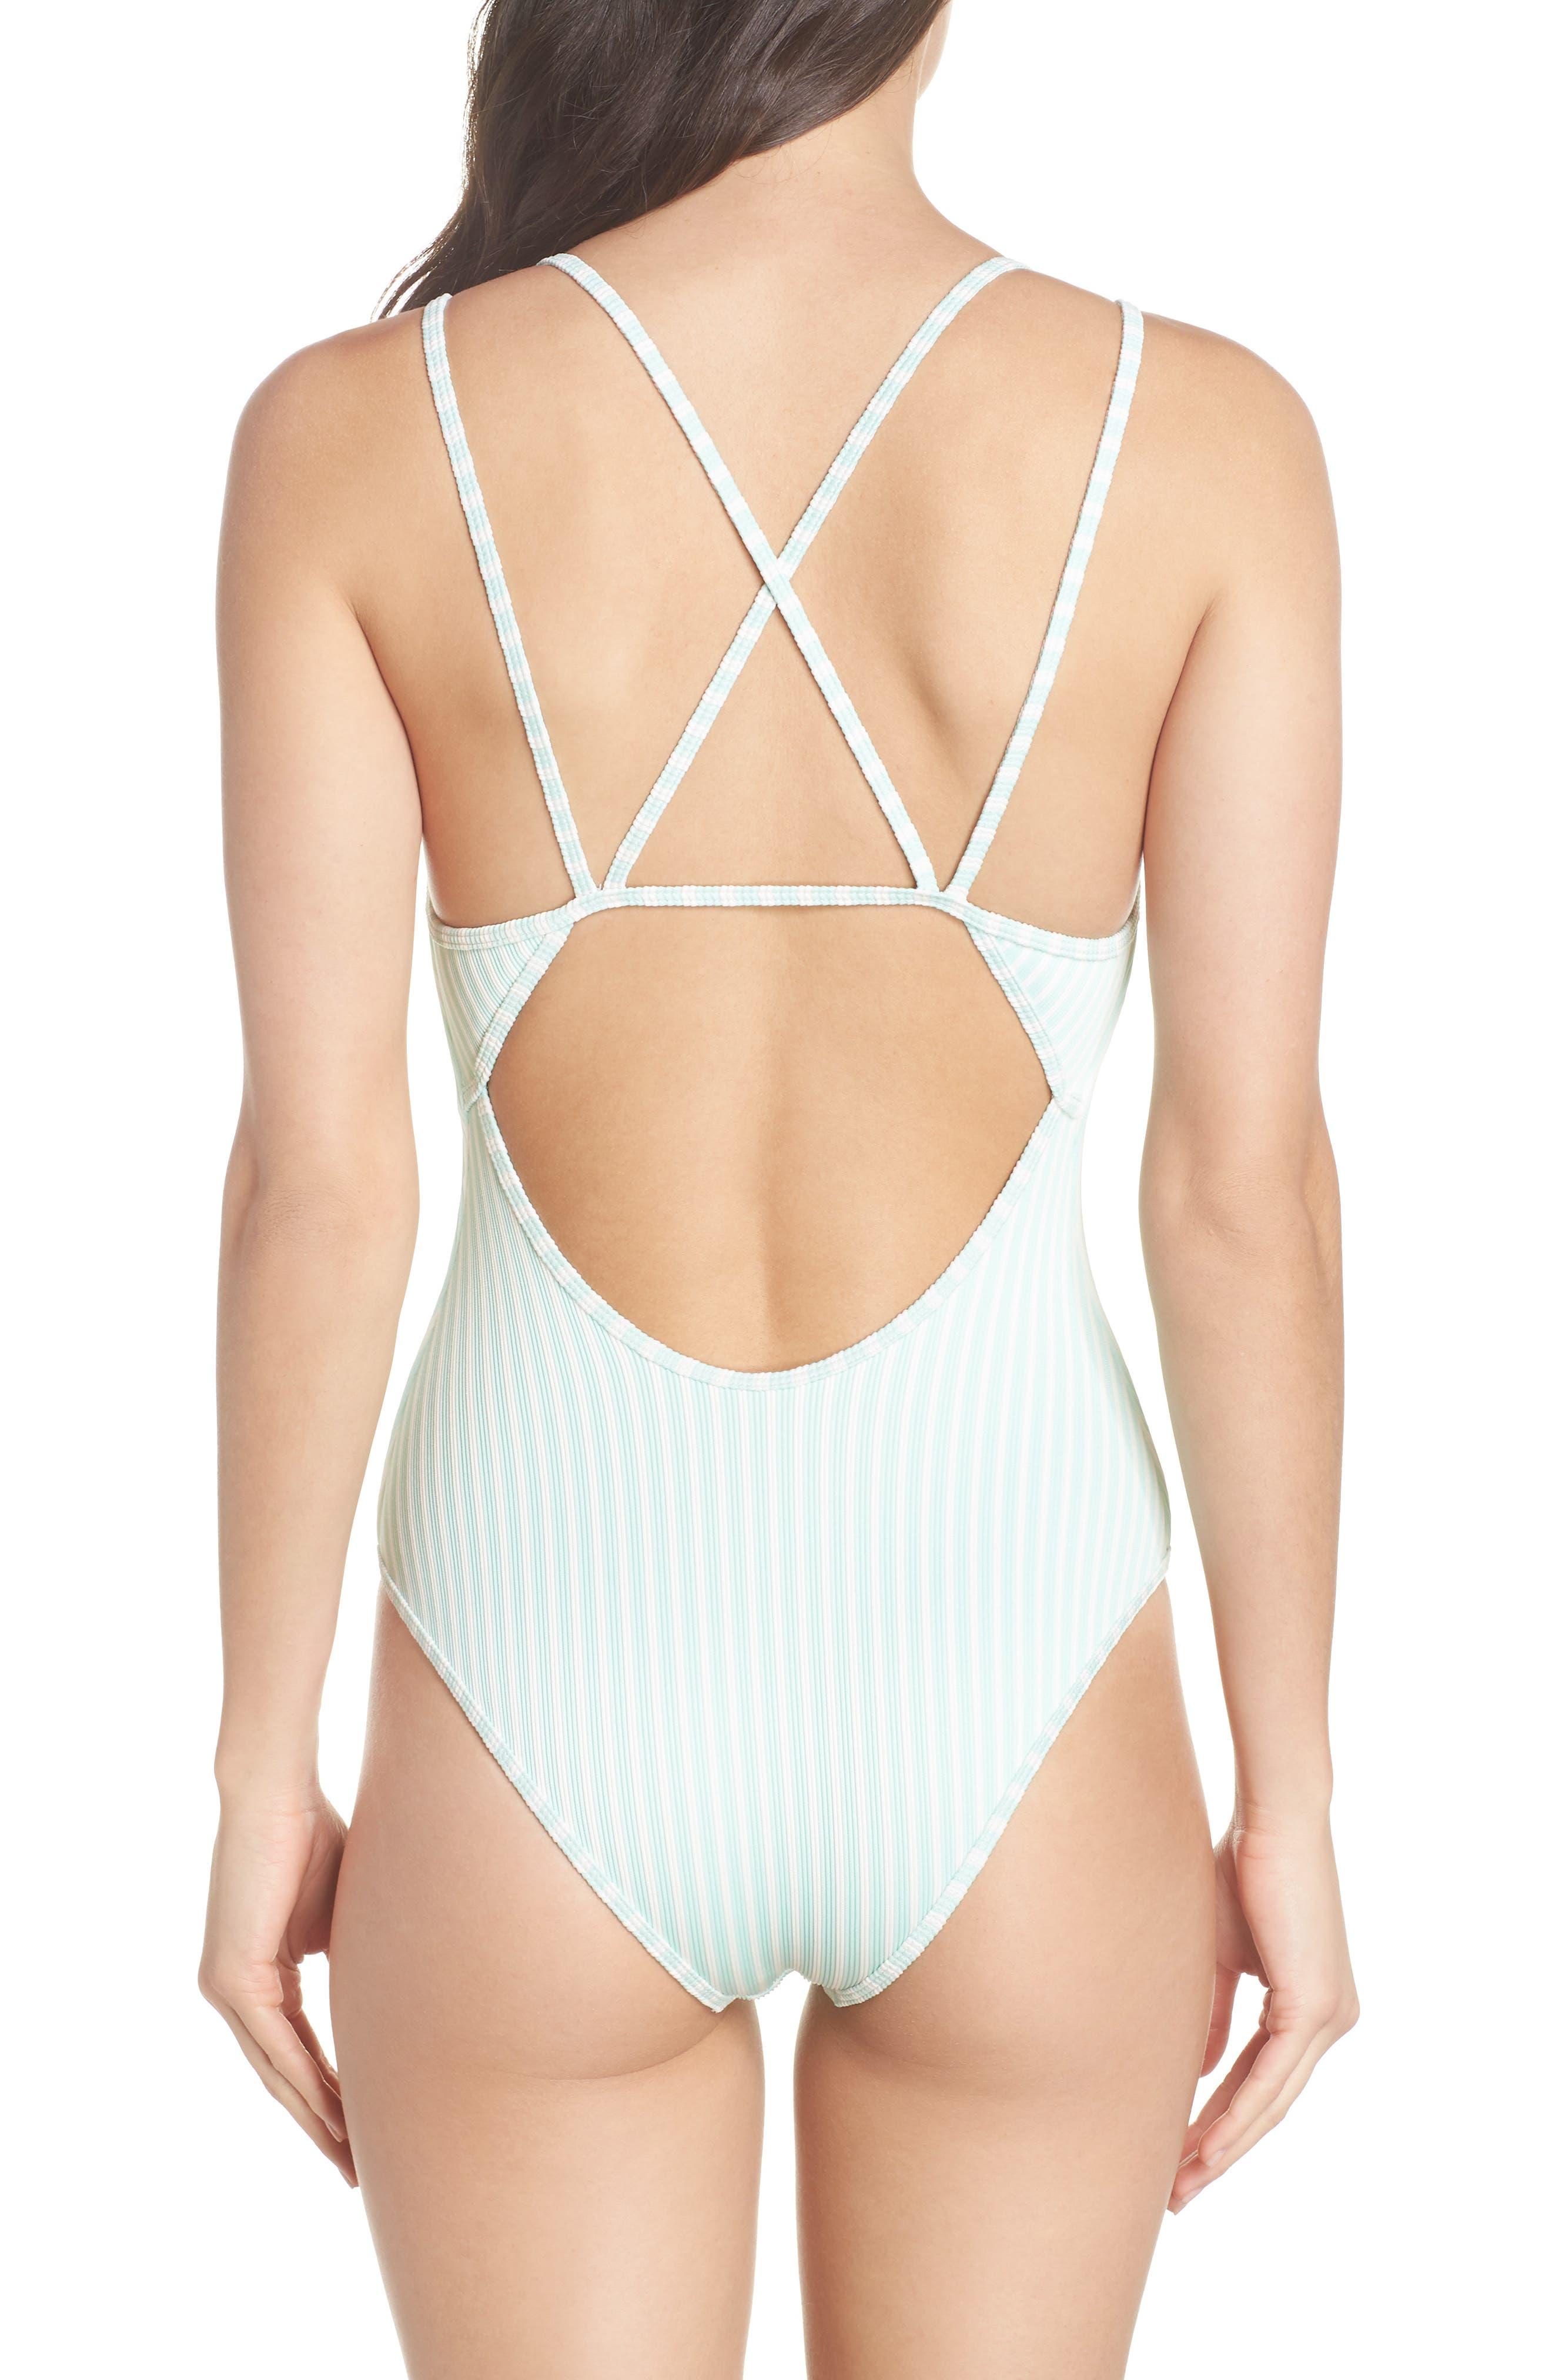 Dakota One-Piece Swimsuit,                             Alternate thumbnail 2, color,                             Spearmint